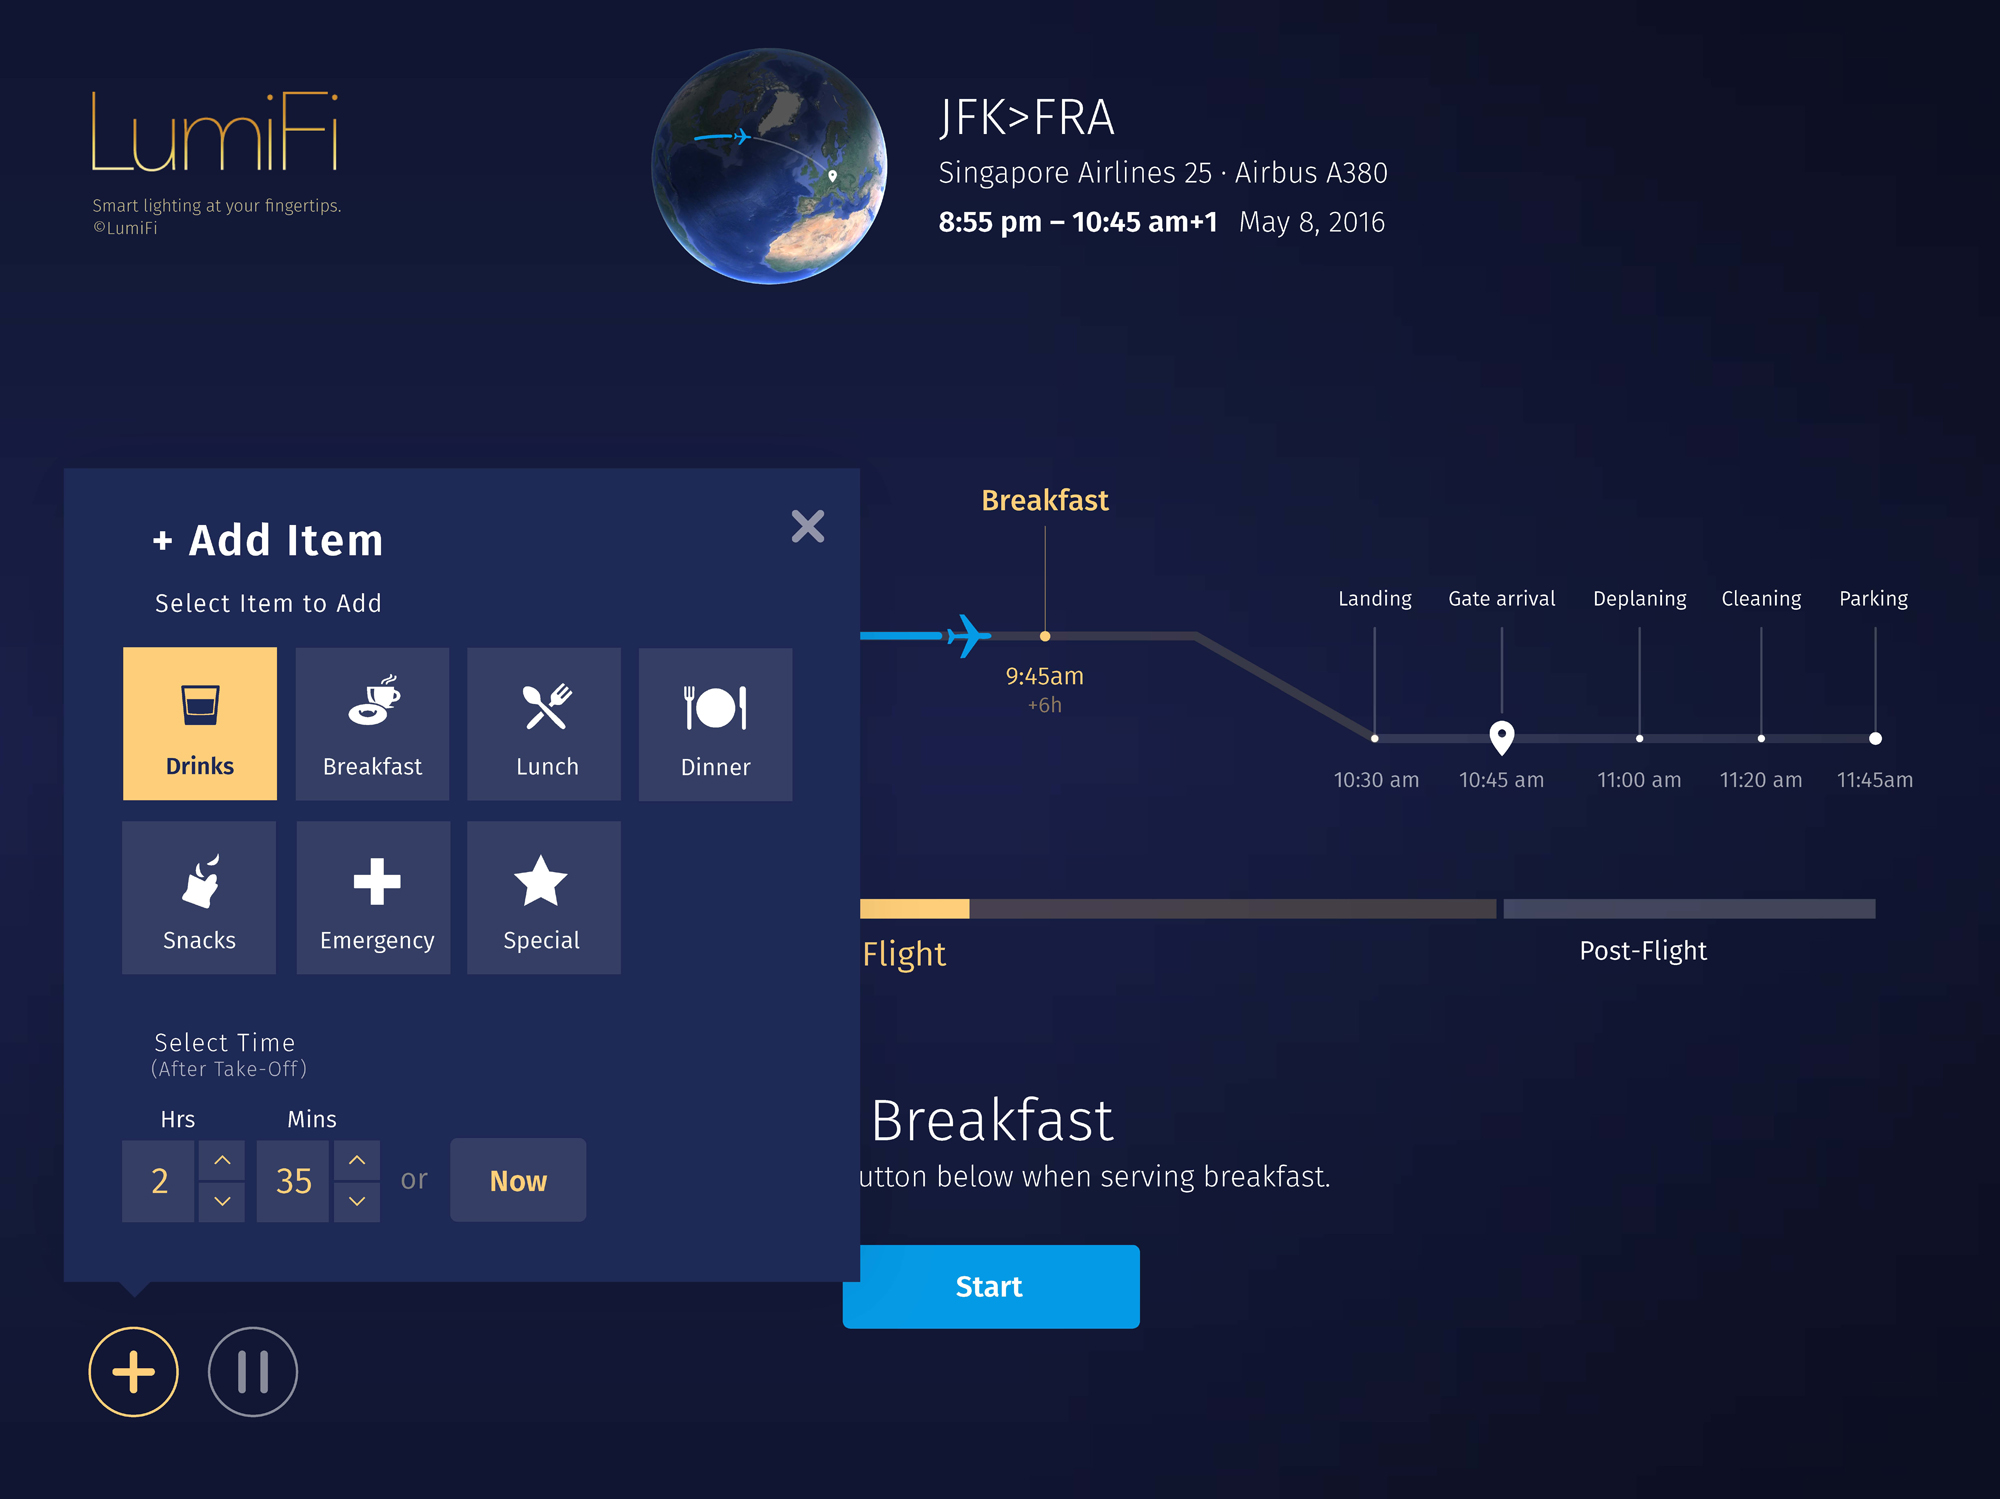 LumiFi-Jetlag-Flight-Control-5bs.JPG